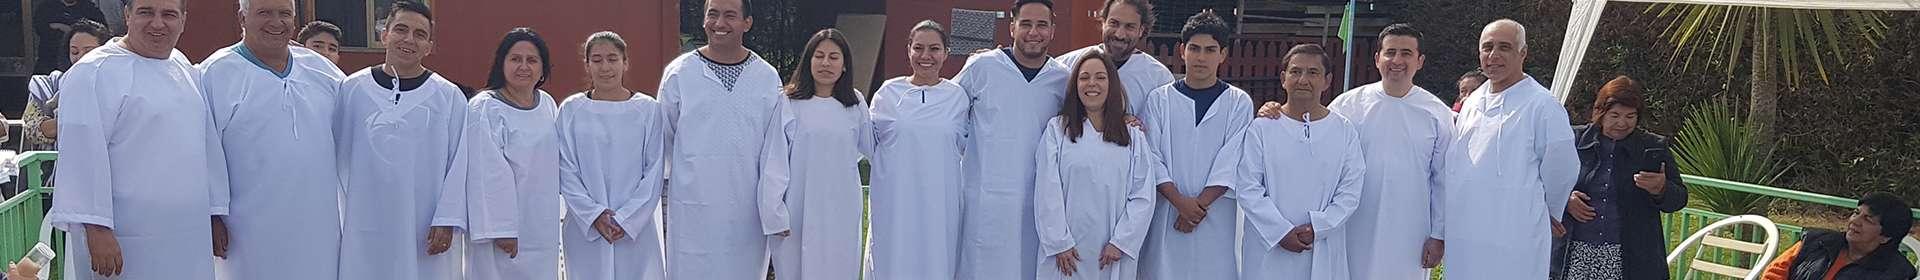 Missão Internacional Cristã Maranata realiza batismo no Chile